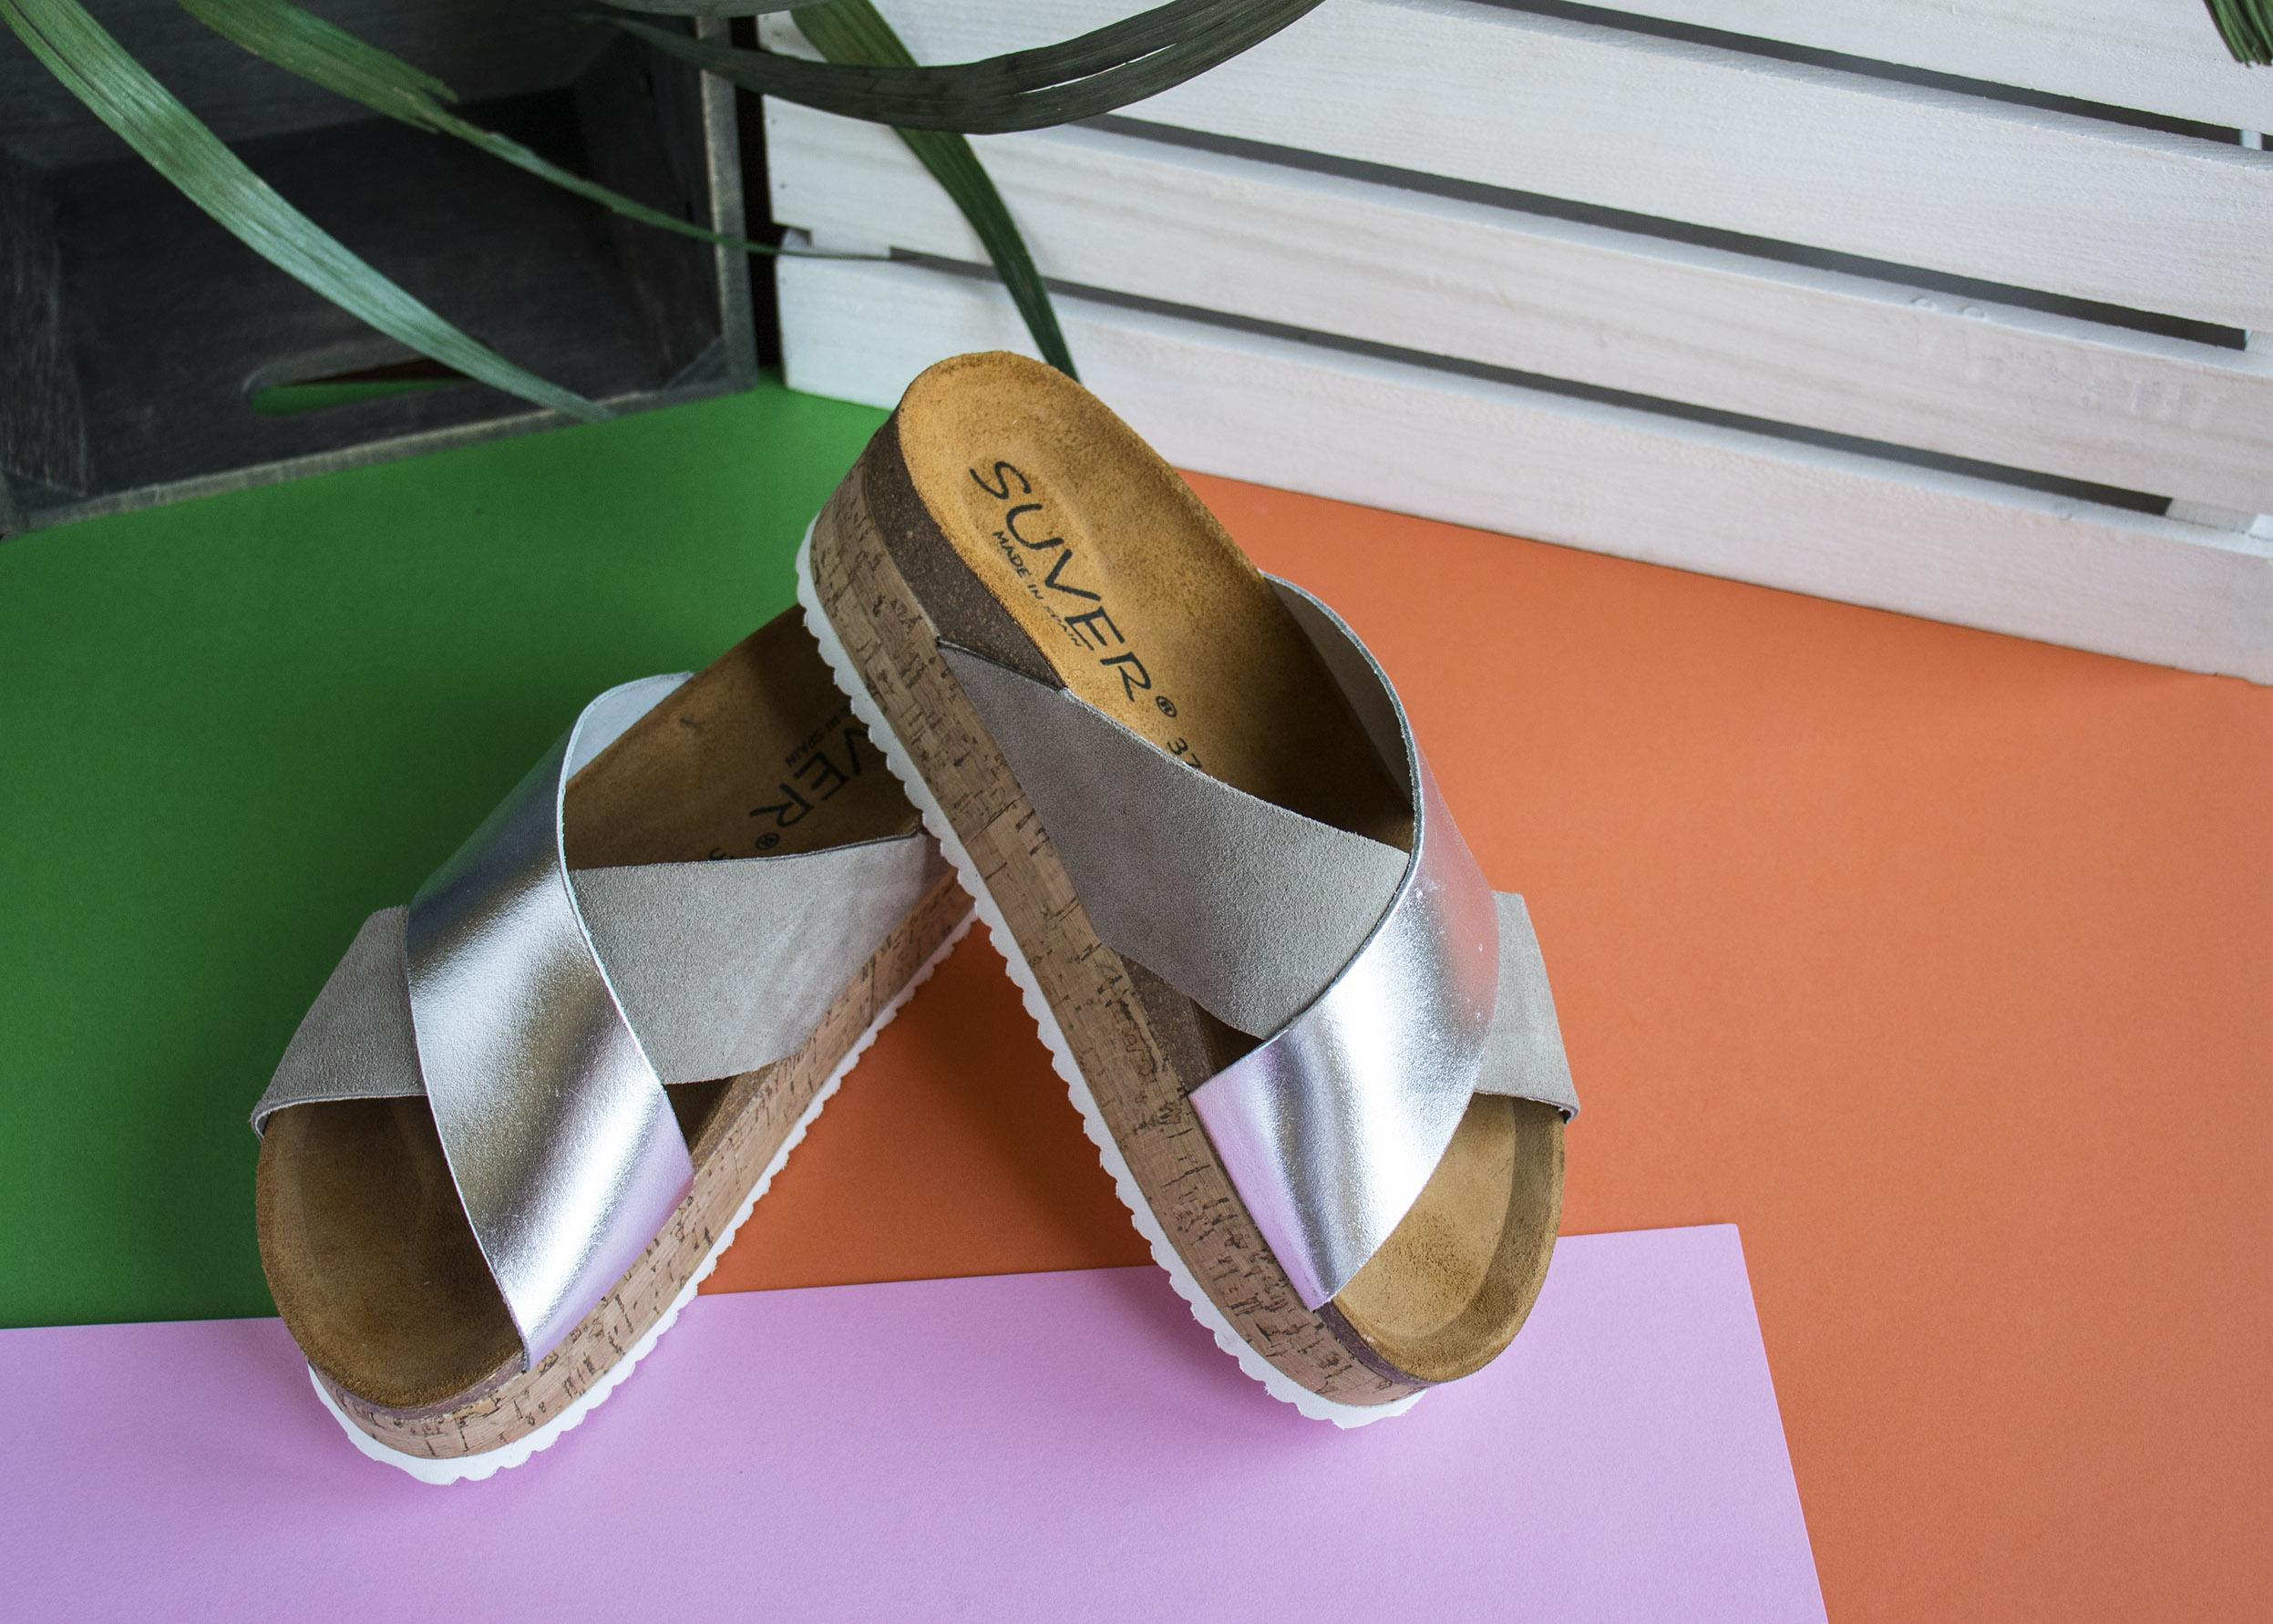 Sandalias estilo zueco de Suver